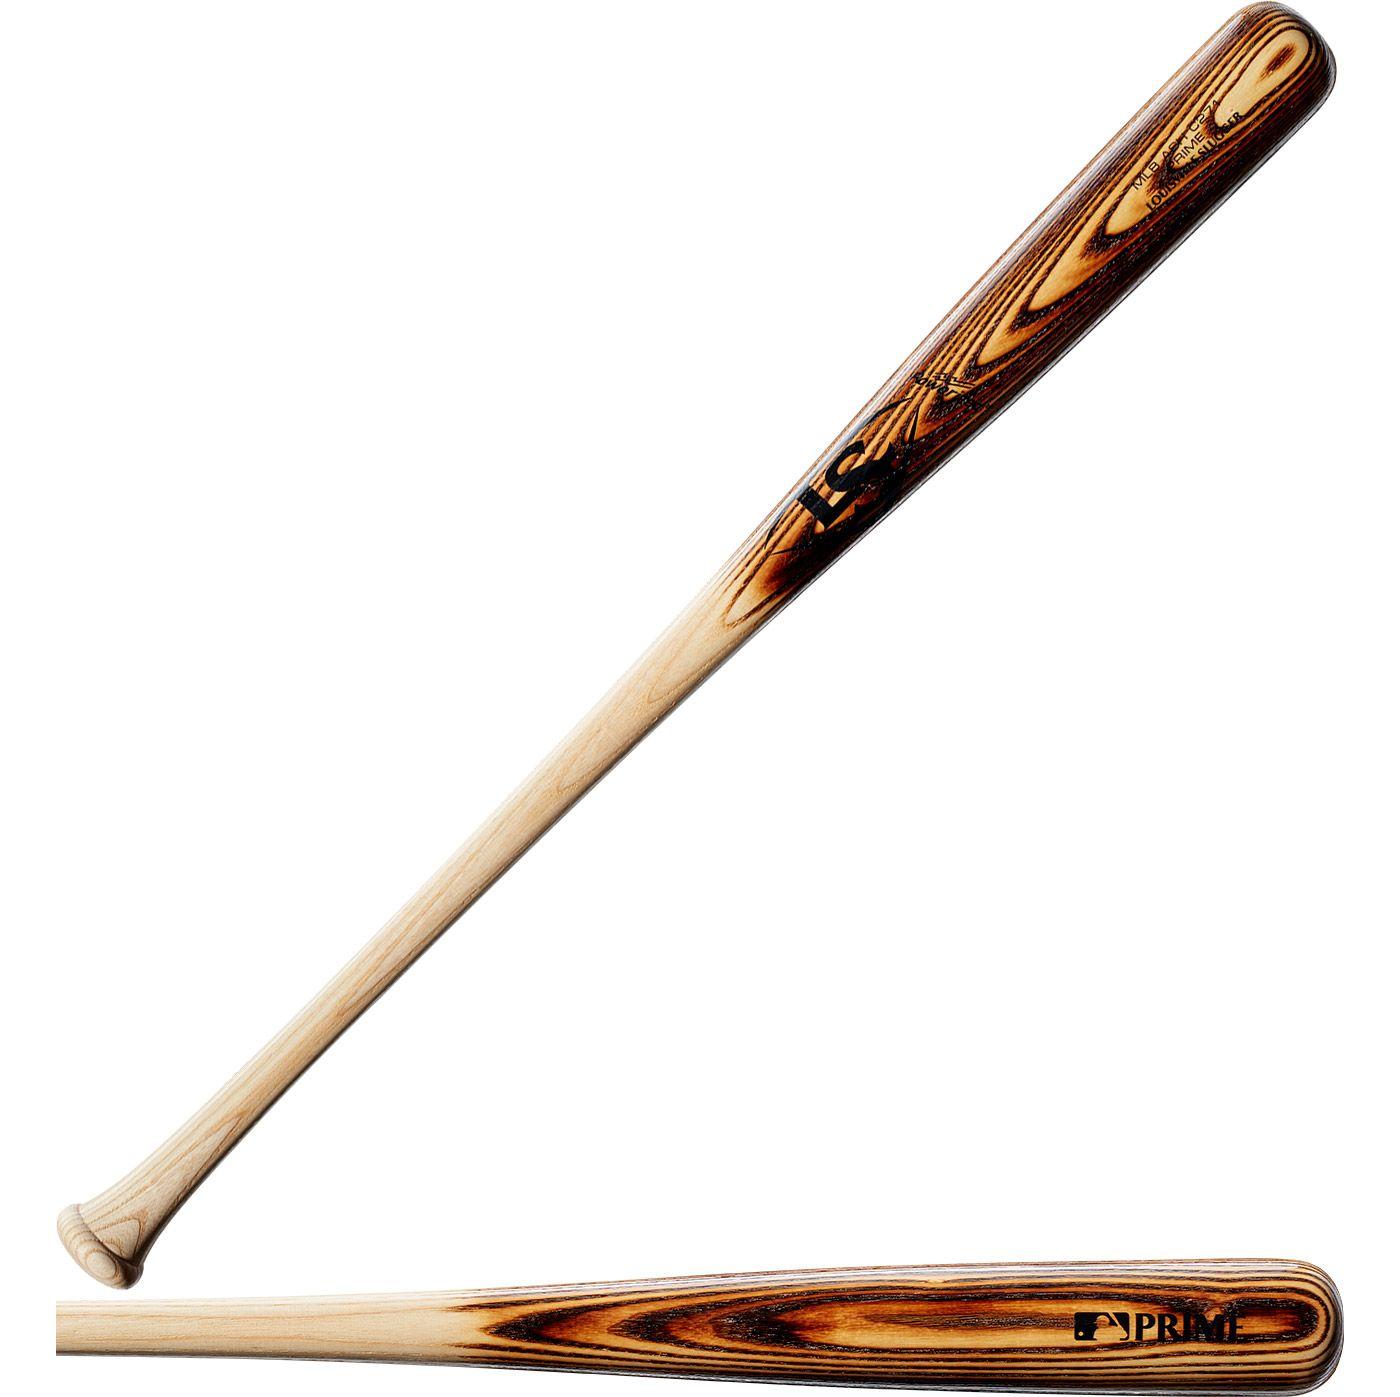 Louisville Slugger MLB Prime C271 Ash Bat